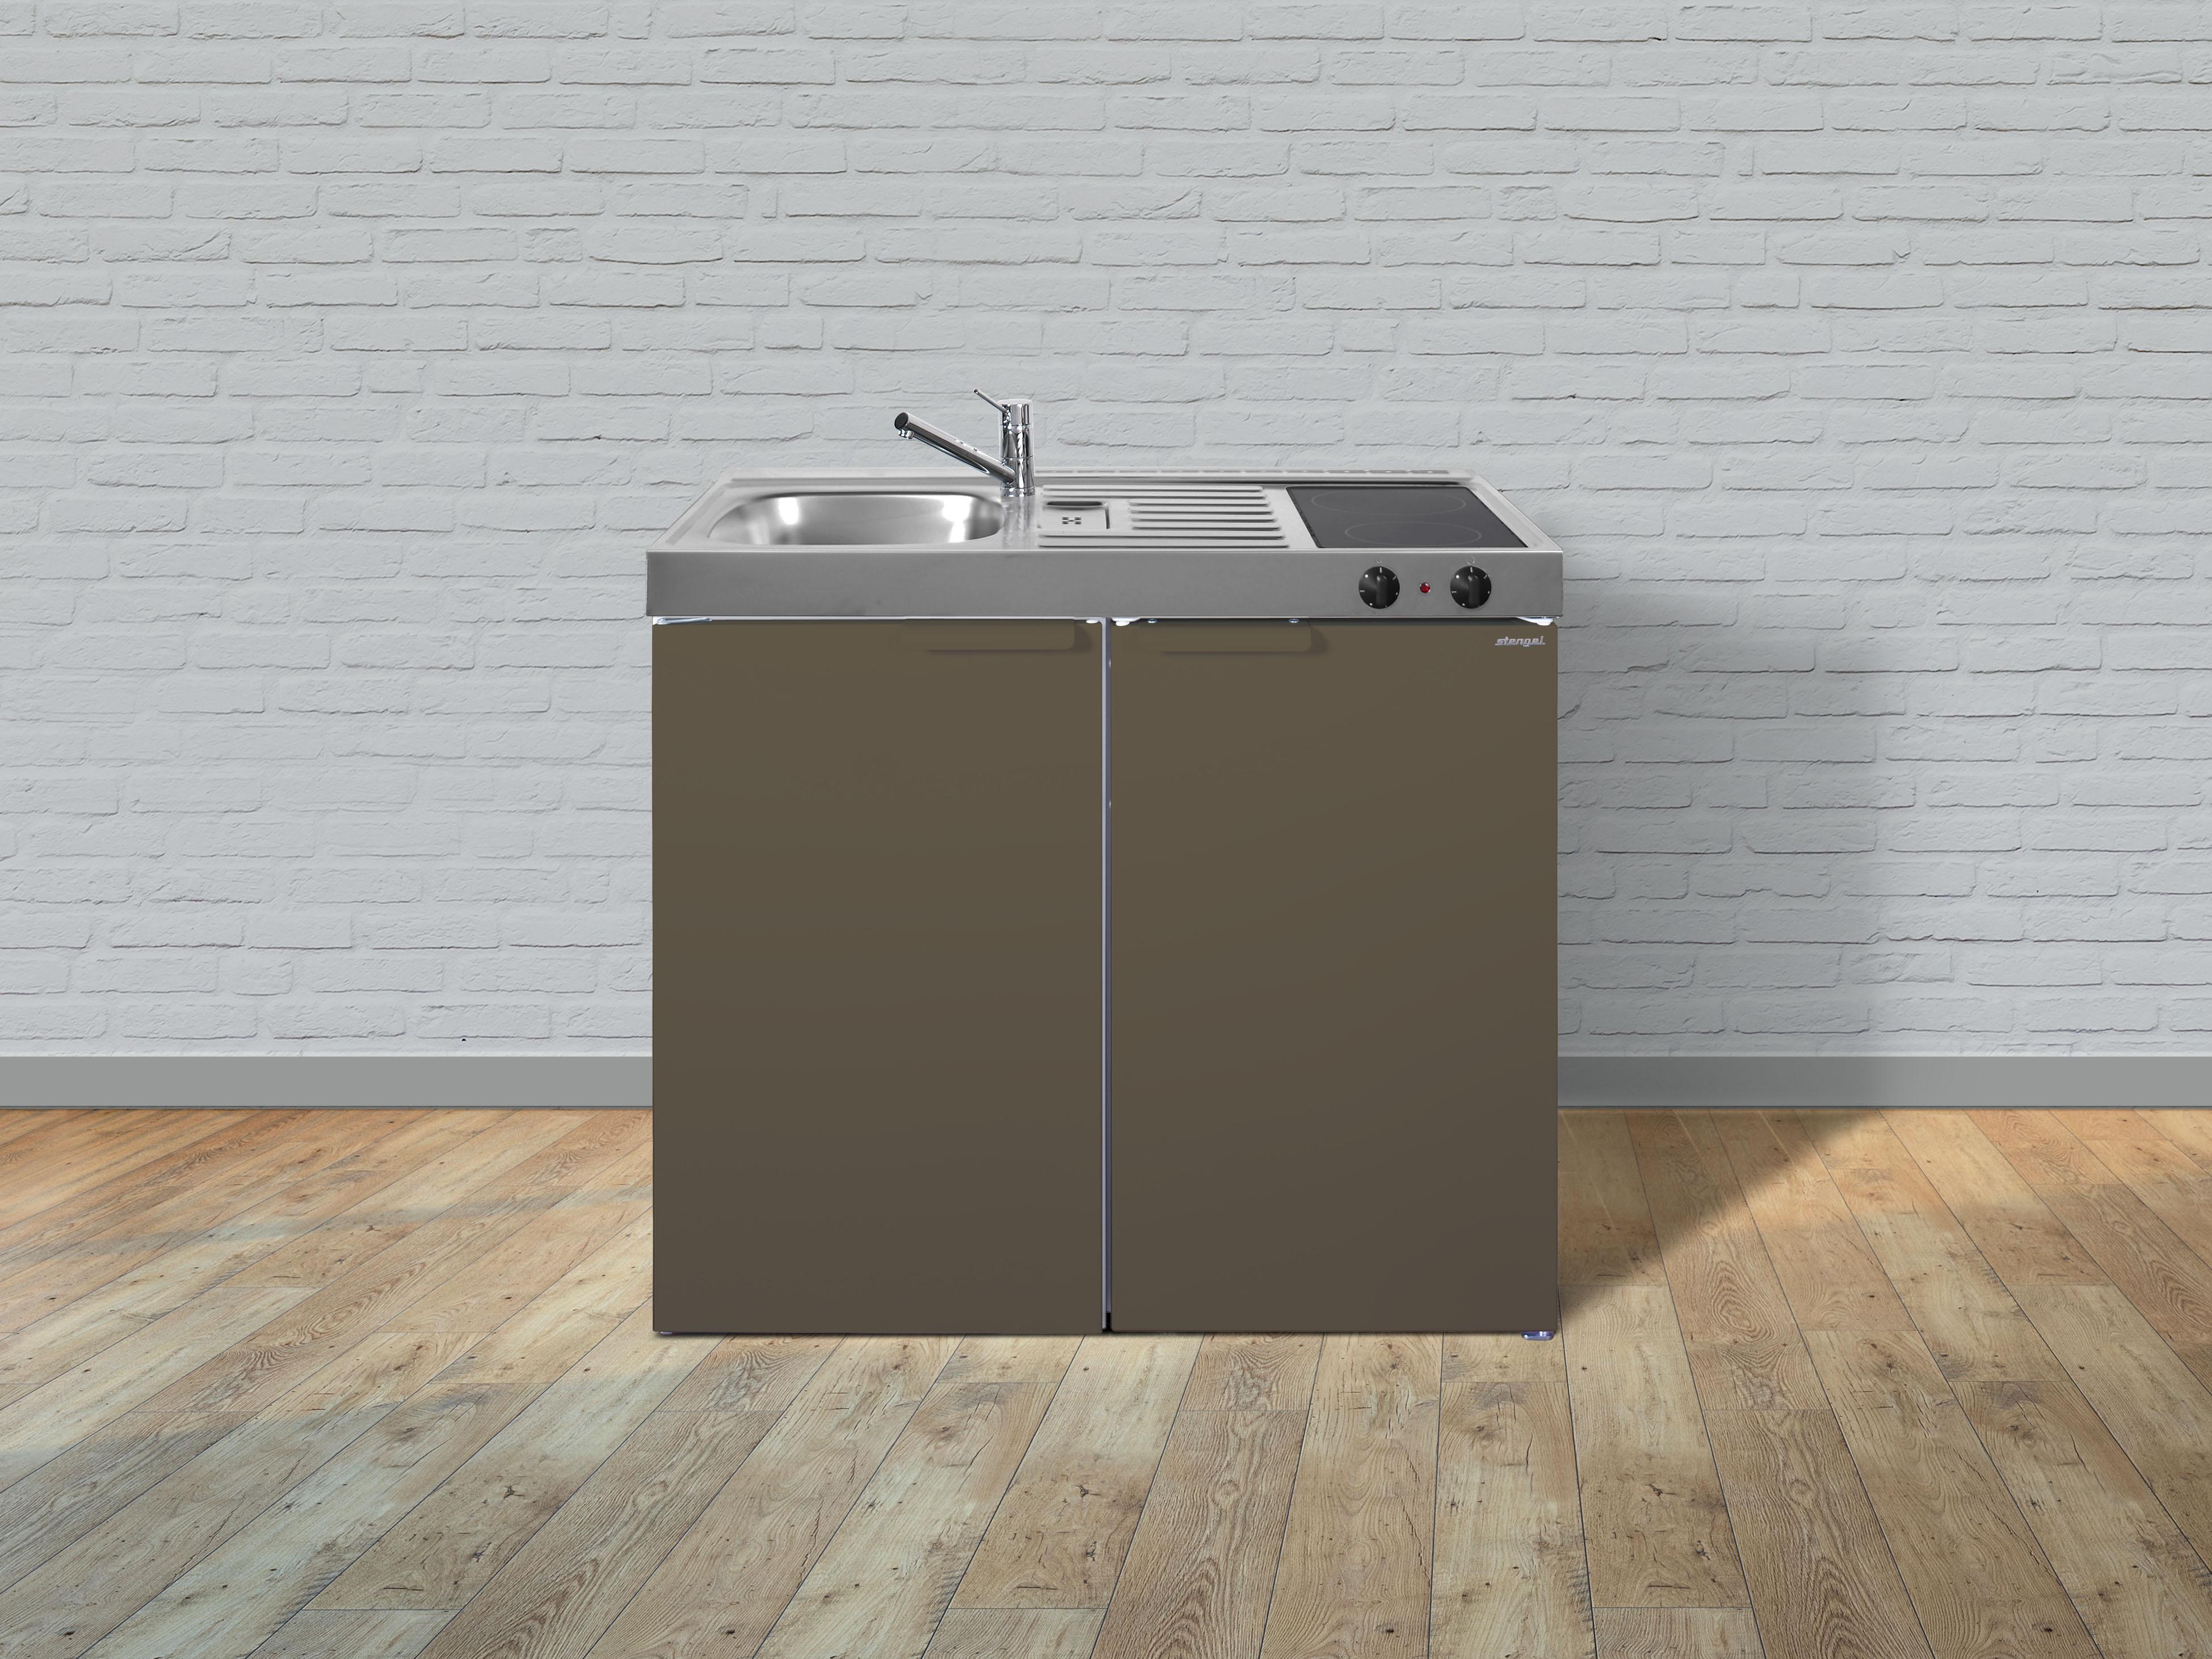 Stengel Mini Single Küche 100cm Metall MK100 Becken rechts braun ohne Kochfeld